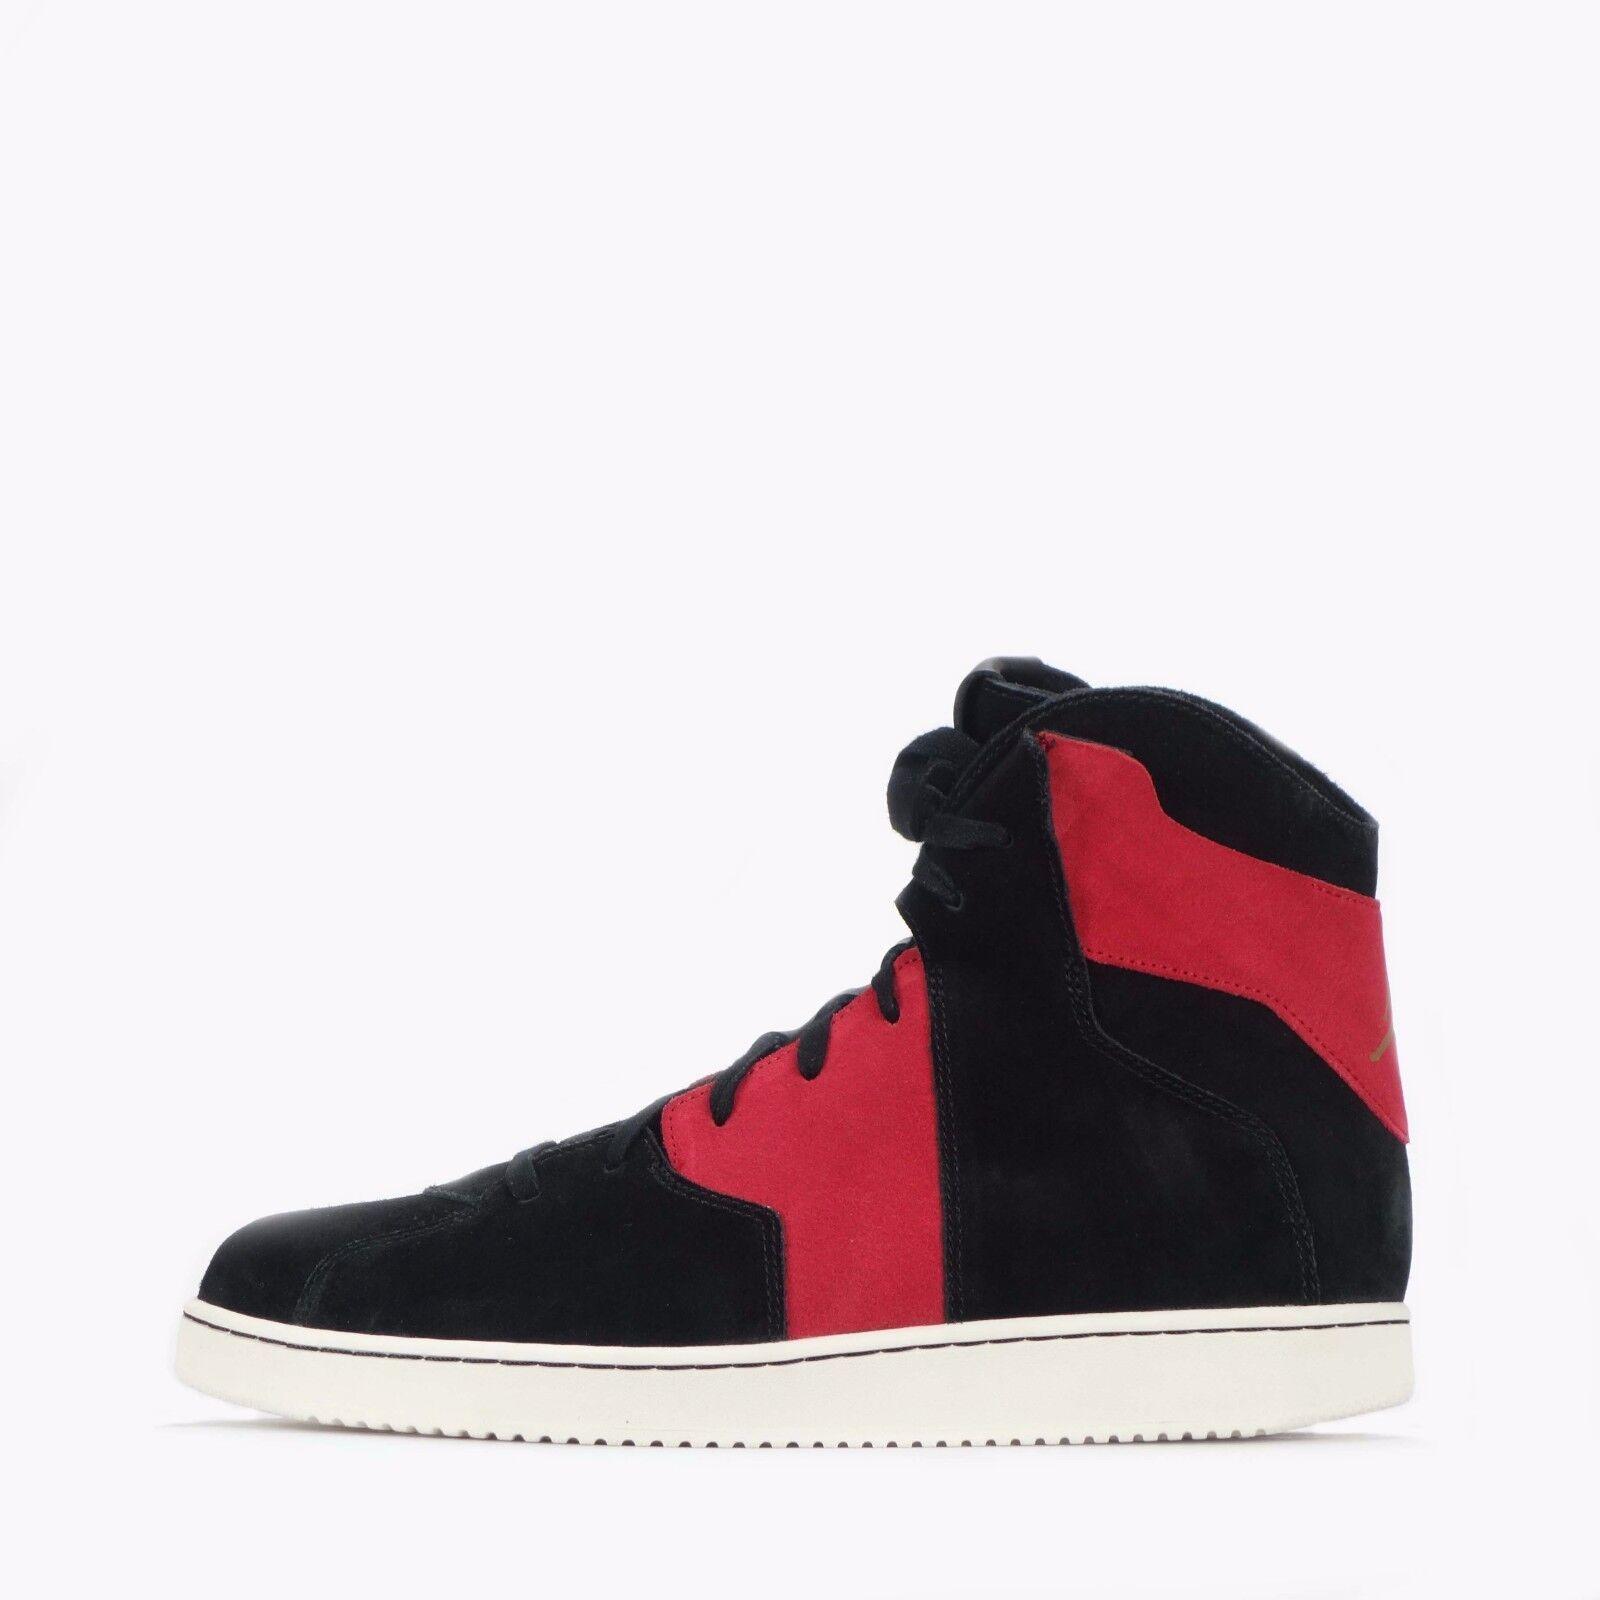 Nike Jordan Westbrook 0.2 Hi Top scarpe  nero  rosso  nuovo di marca